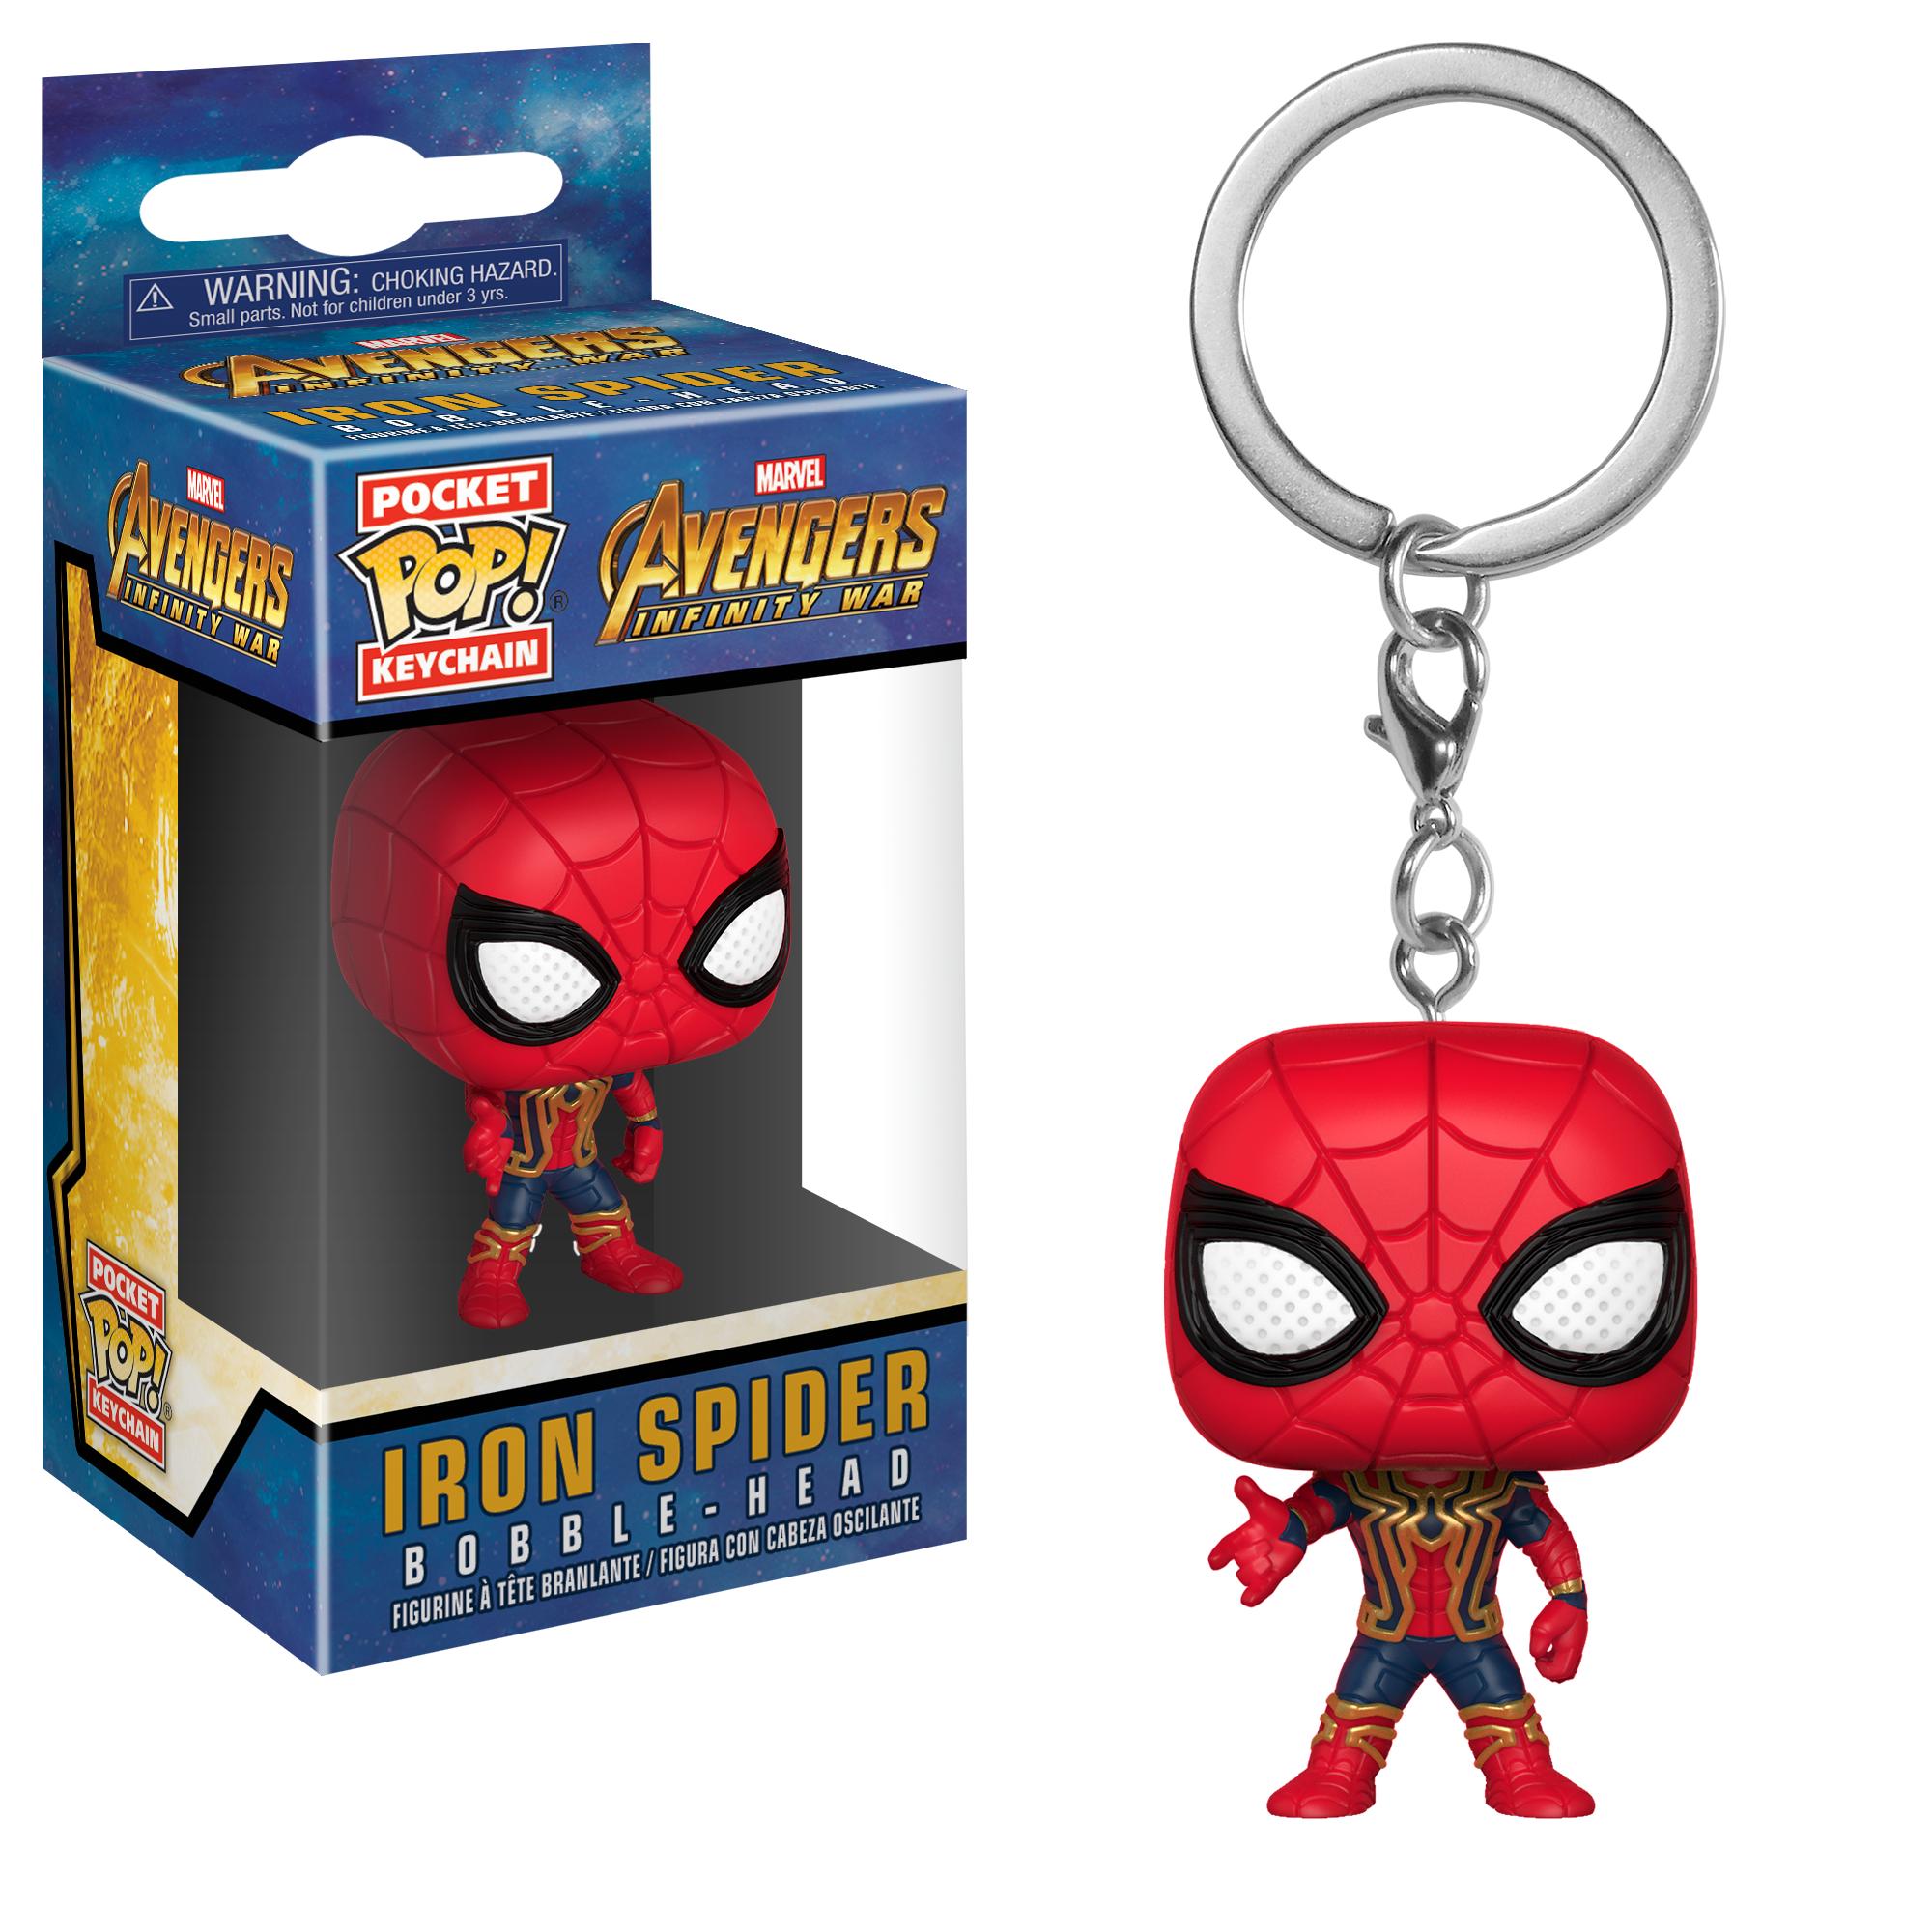 Брелок Funko Pocket POP! Keychain: Marvel: Avengers Infinity War: Iron Spider 27302-PDQ